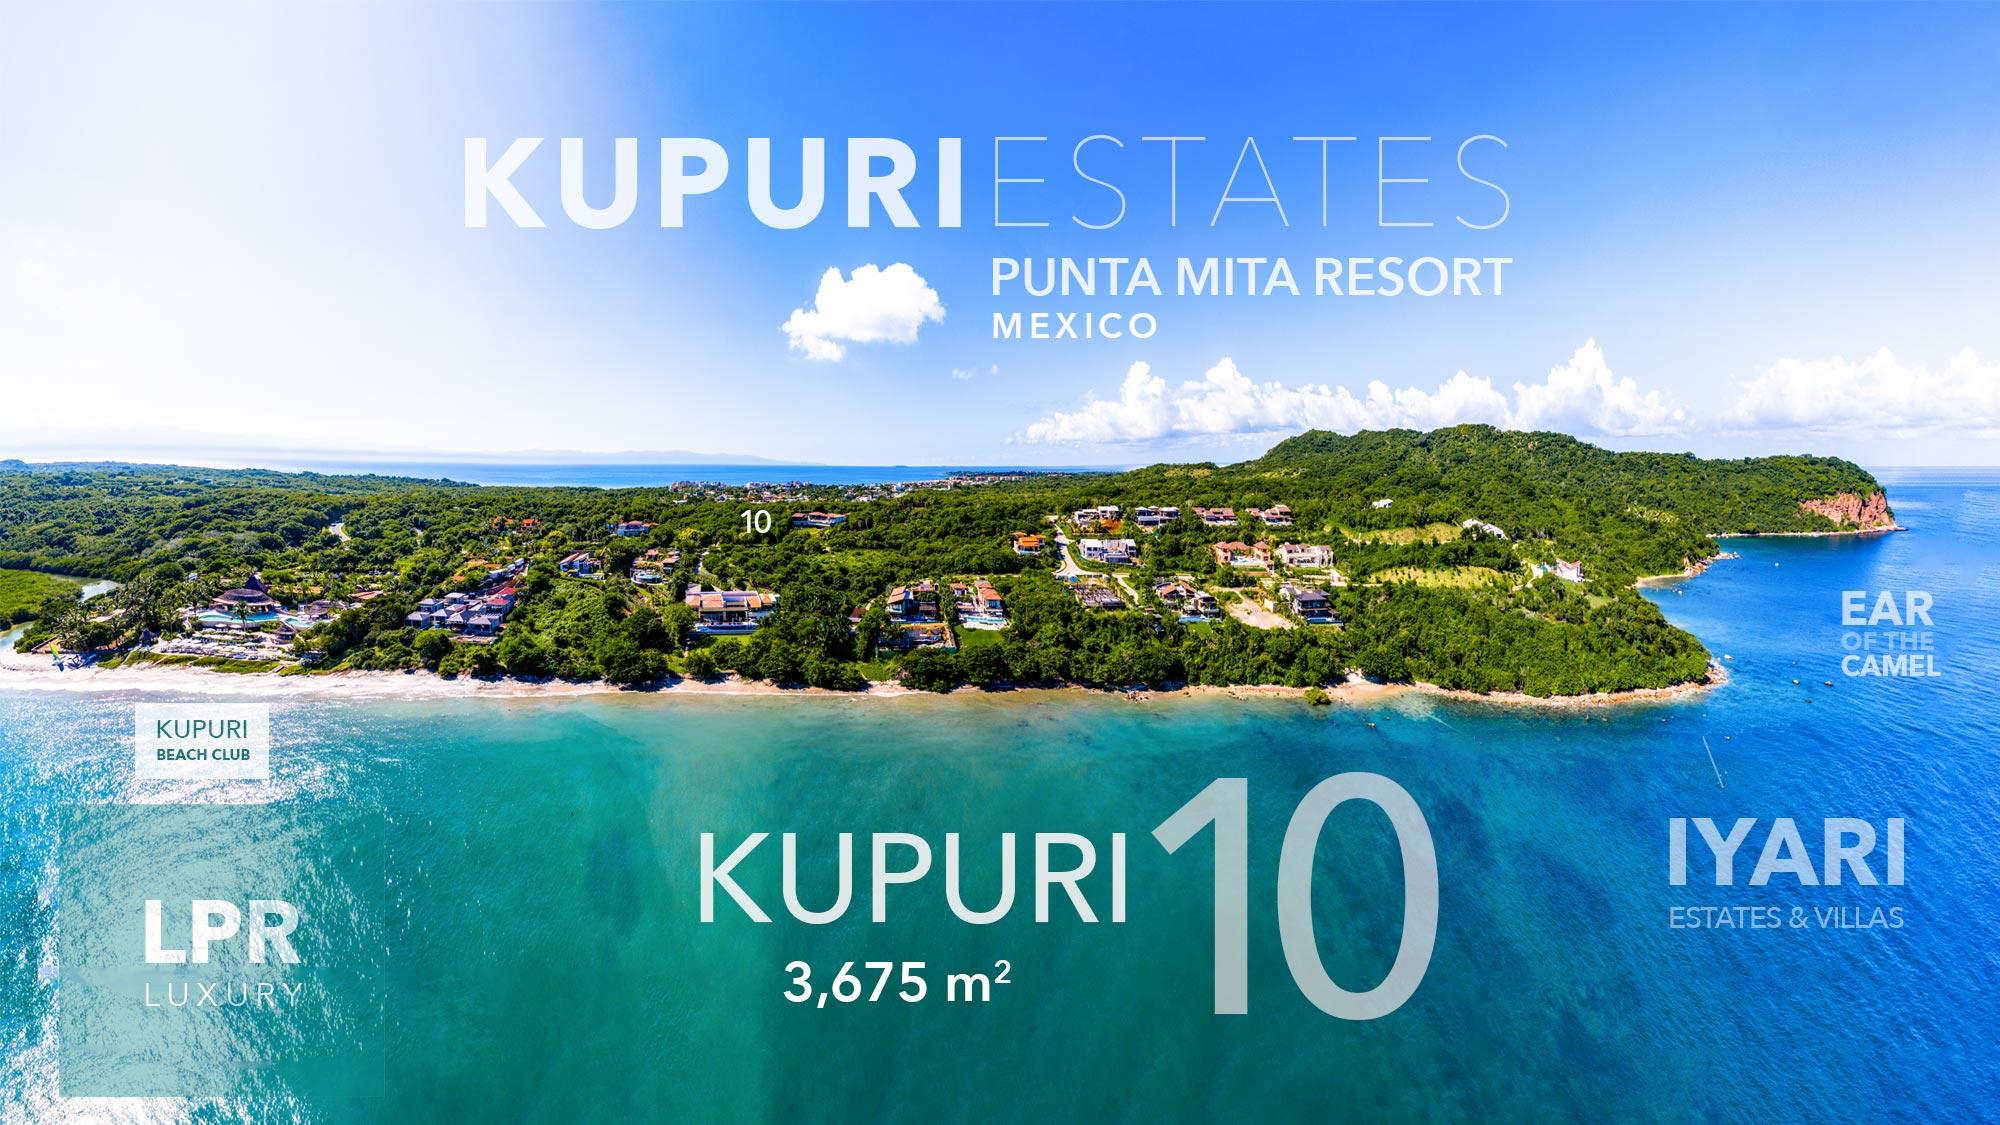 Kupuri lot 10 - Luxury homesite building lot for sale at the Punta Mita Resort, Riviera Nayarit, Mexico